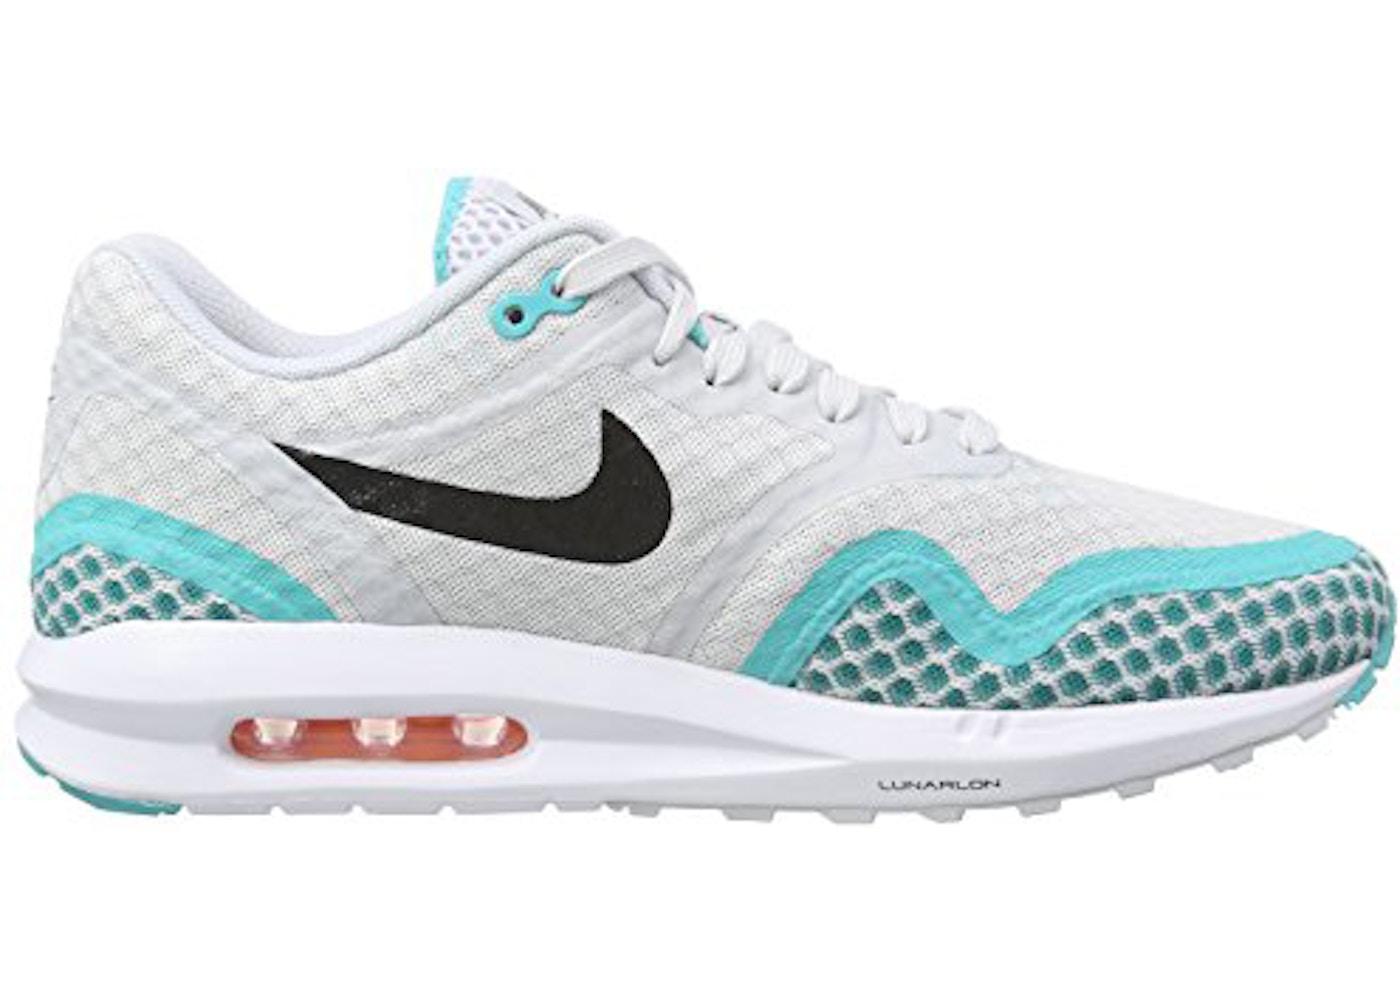 Nike Air Max 1 Lunar Breeze Pure Platinum - 684808-002